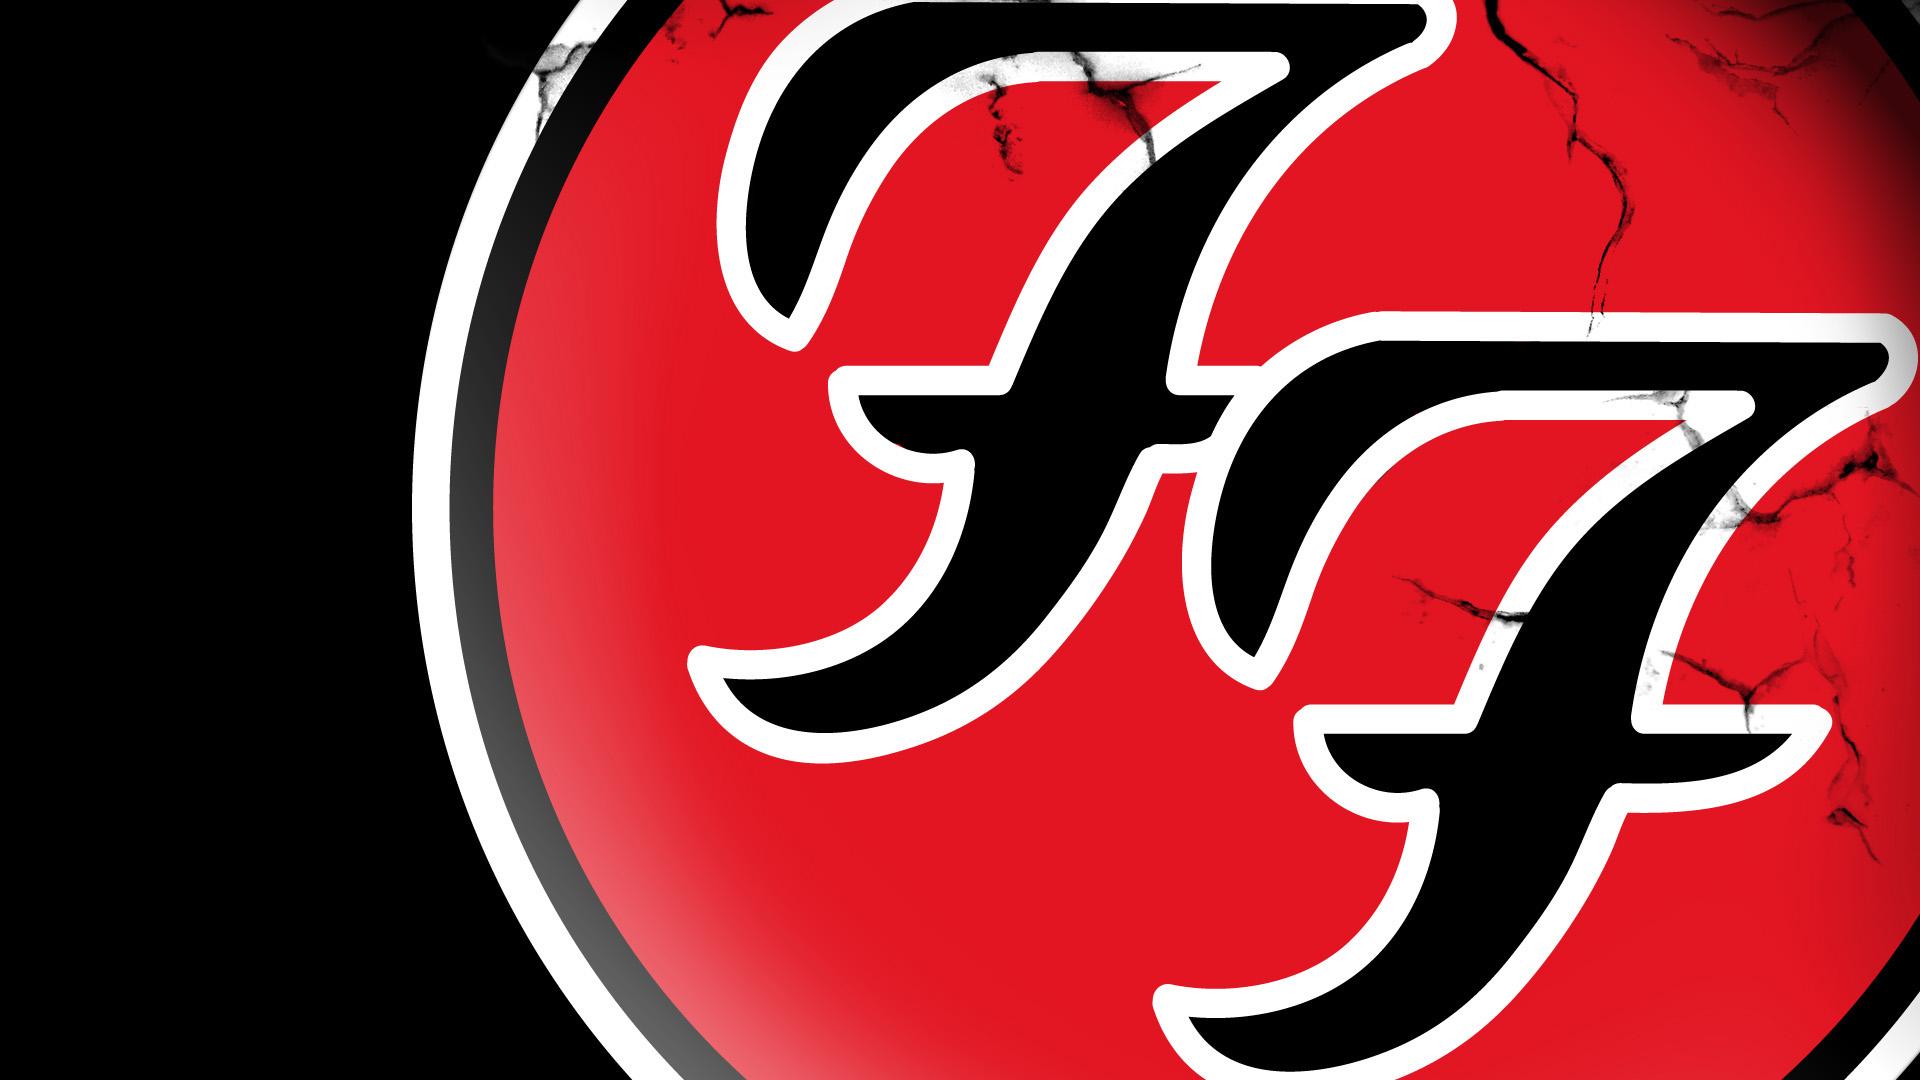 foo fighters logo closeup wallpaper HD 1920x1080